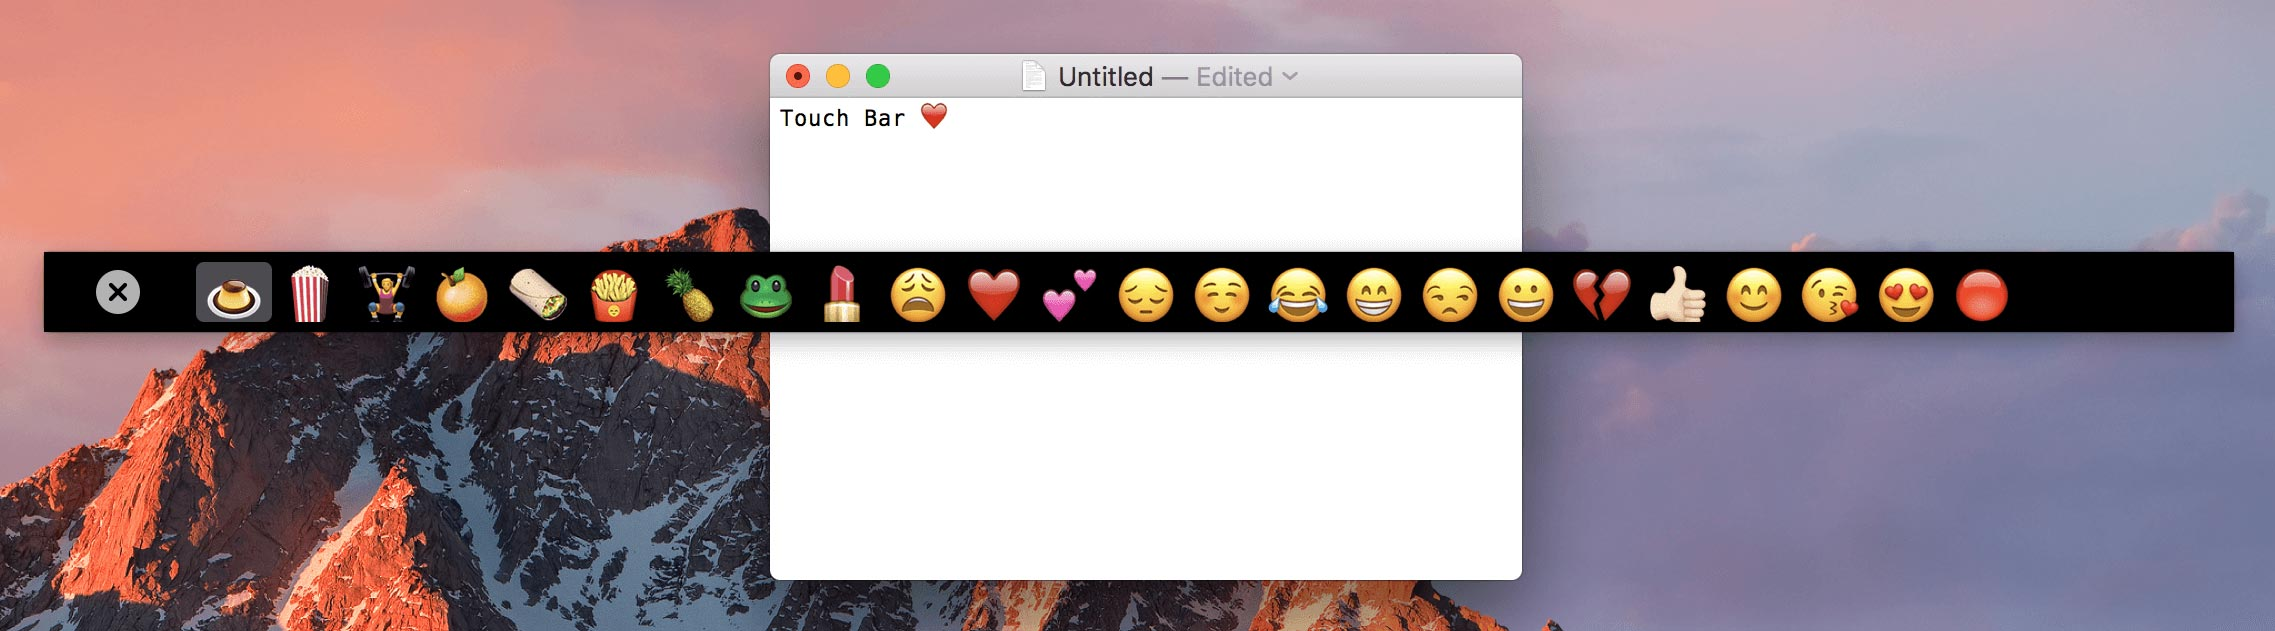 TouchBarDemoApp on GitHub: Run Touch Bar on iPad or macOS Screen